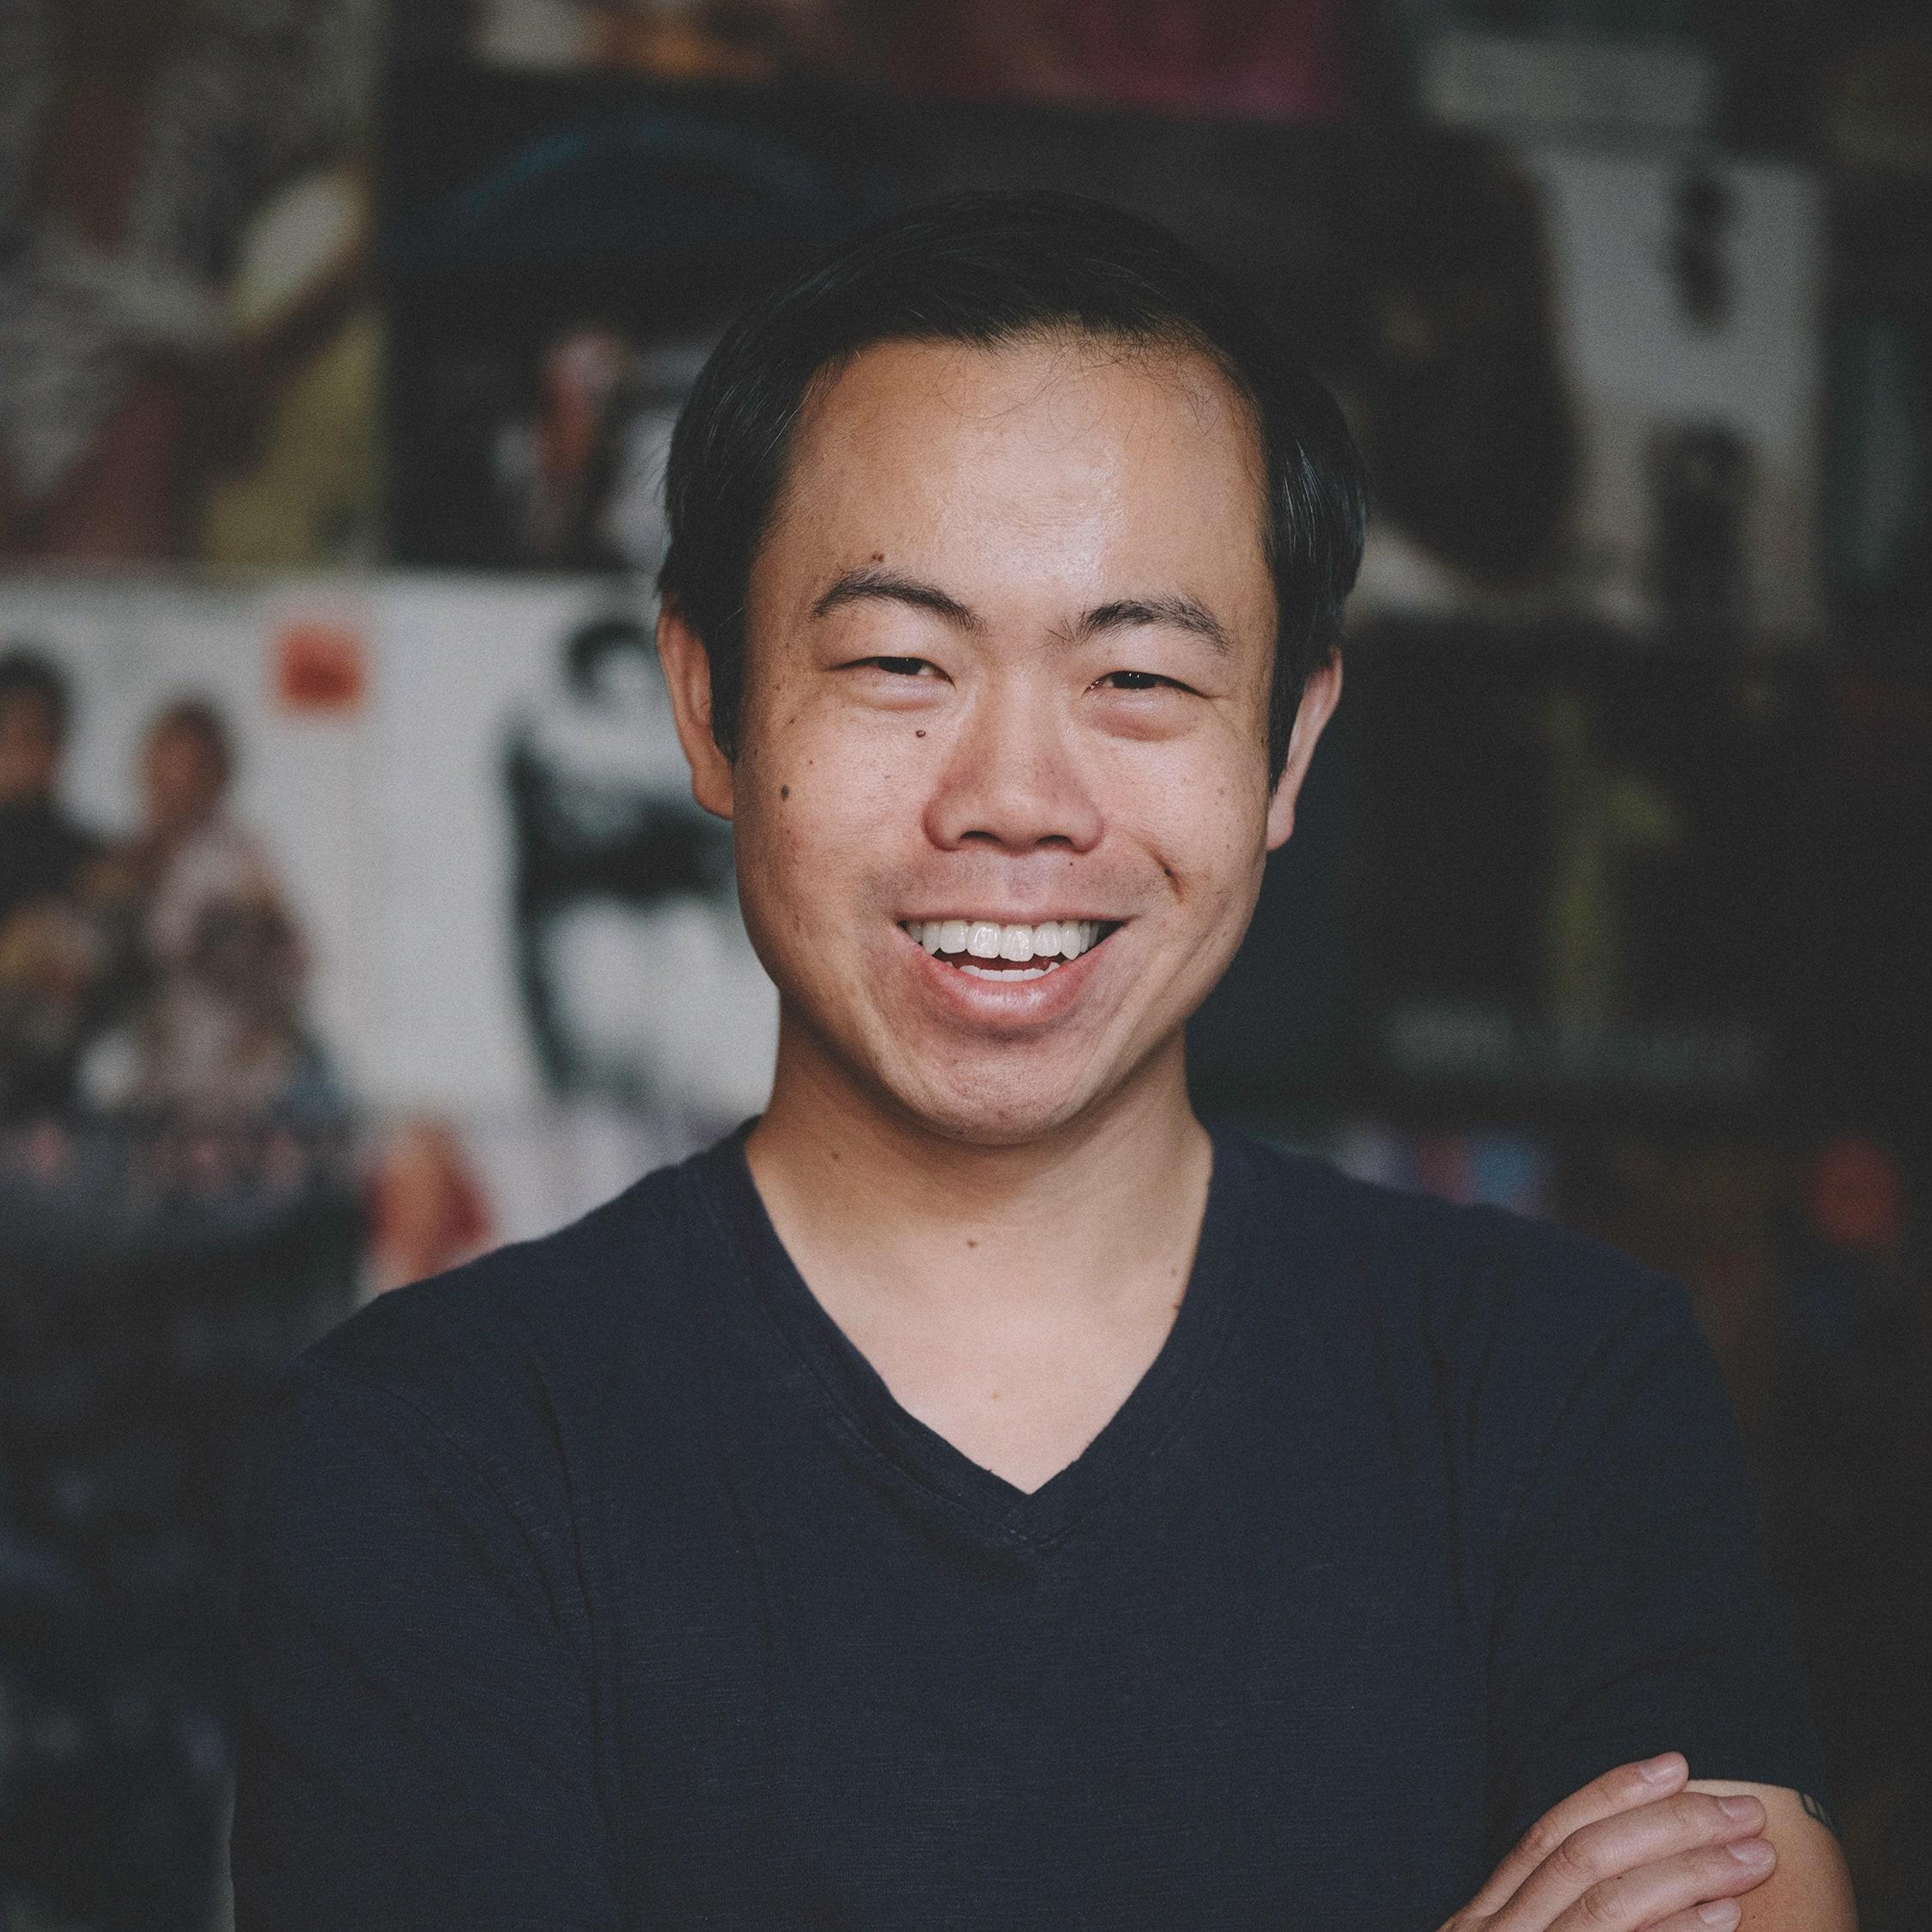 Anthony Ha